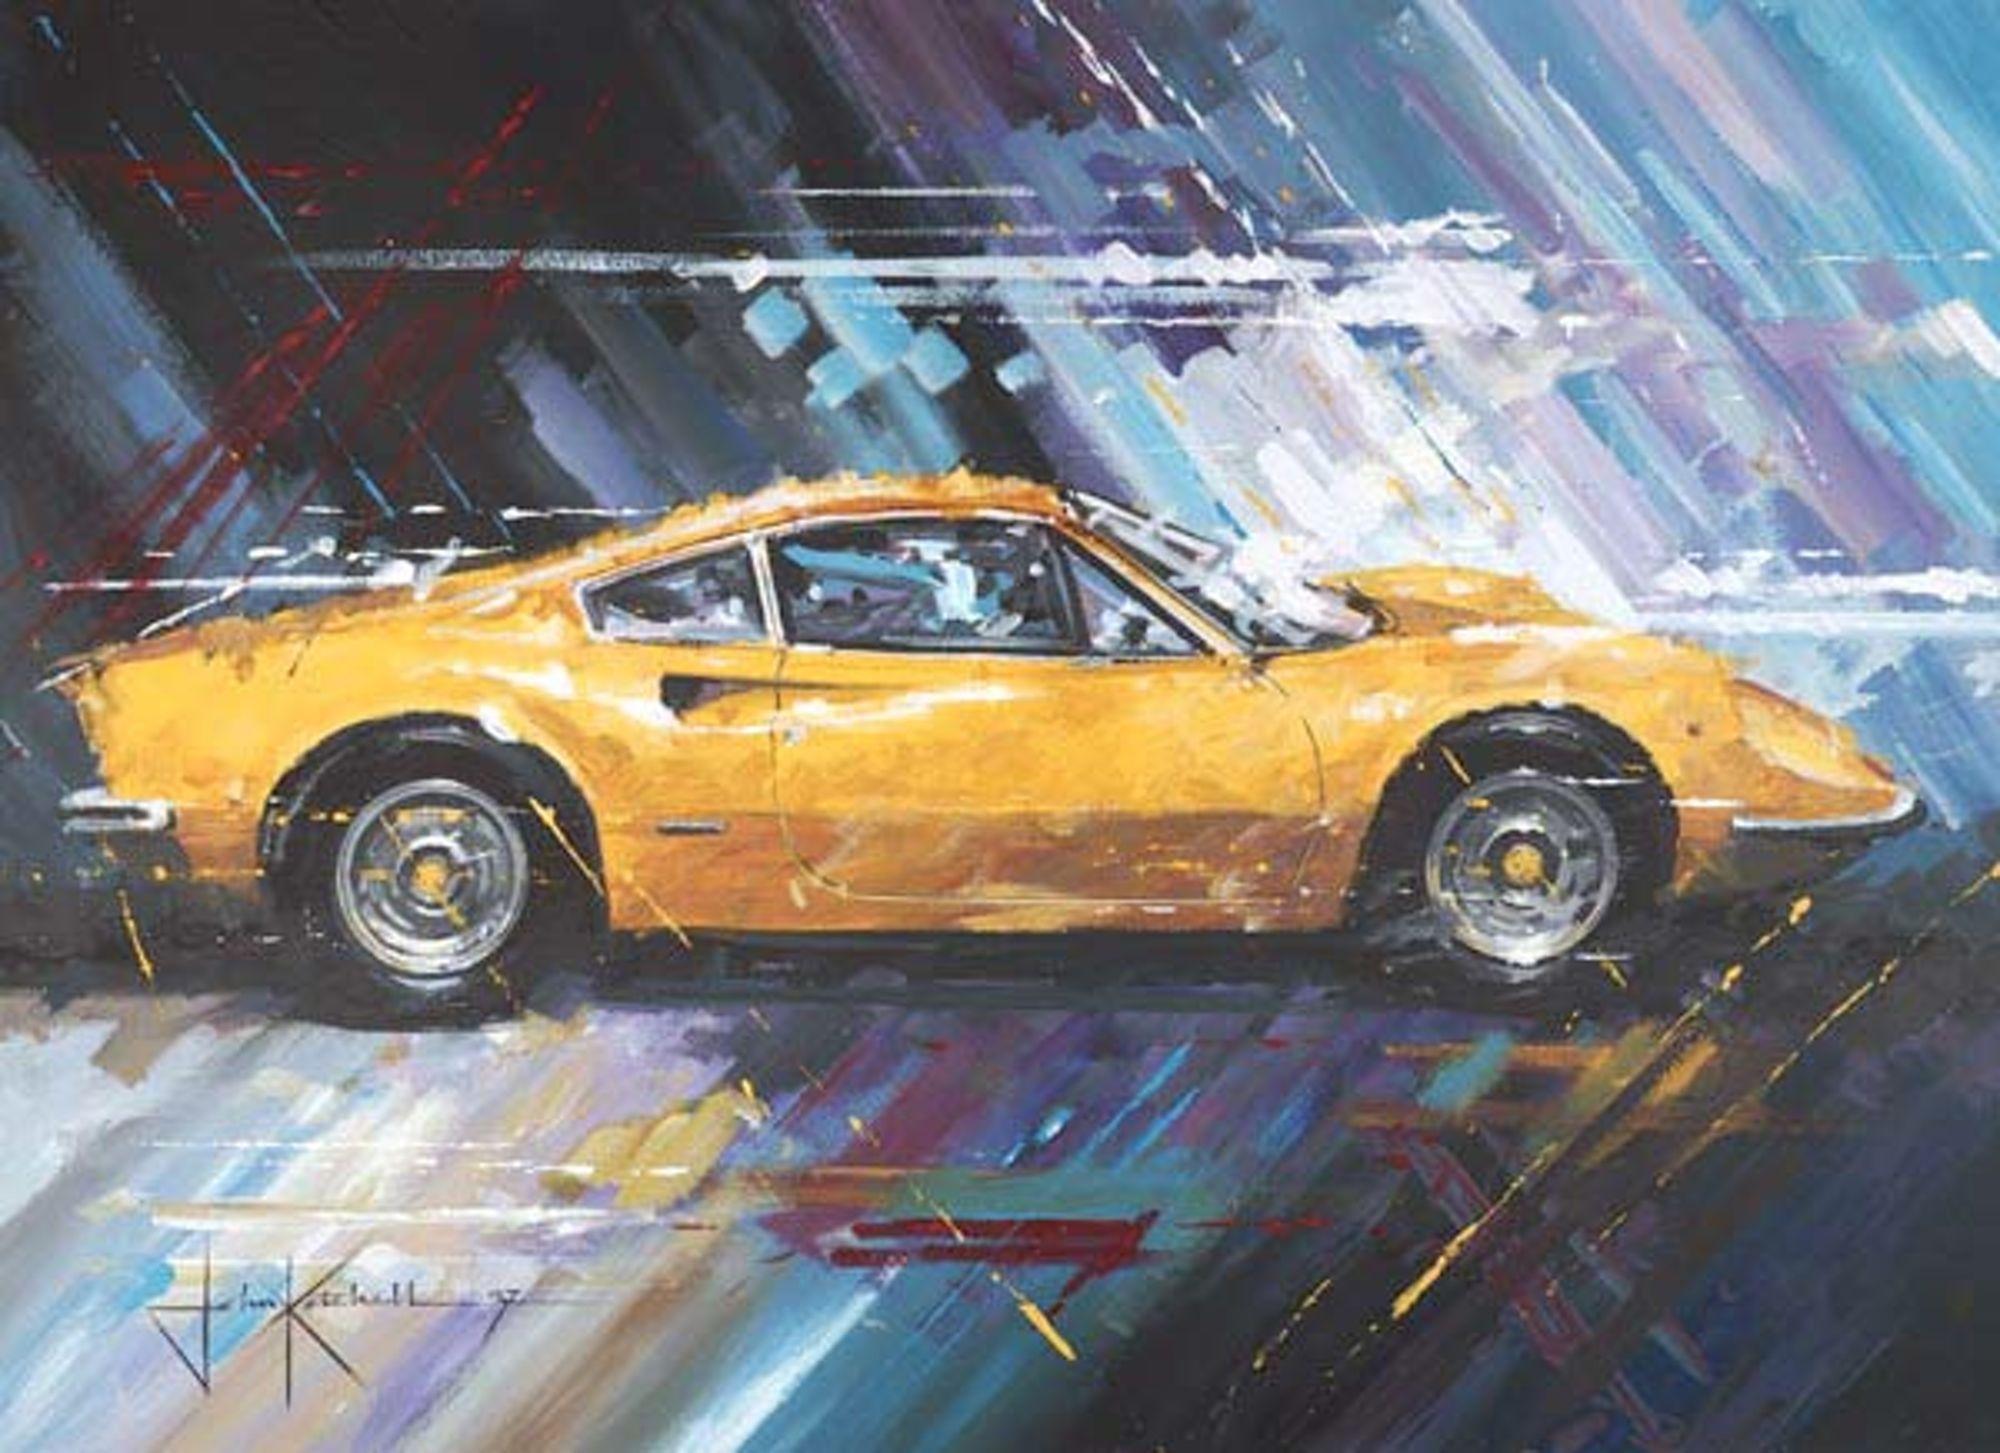 John Ketchell Paints Semi Abstract Racing Fury Cool Car Drawings Art Cars Auto Racing Art